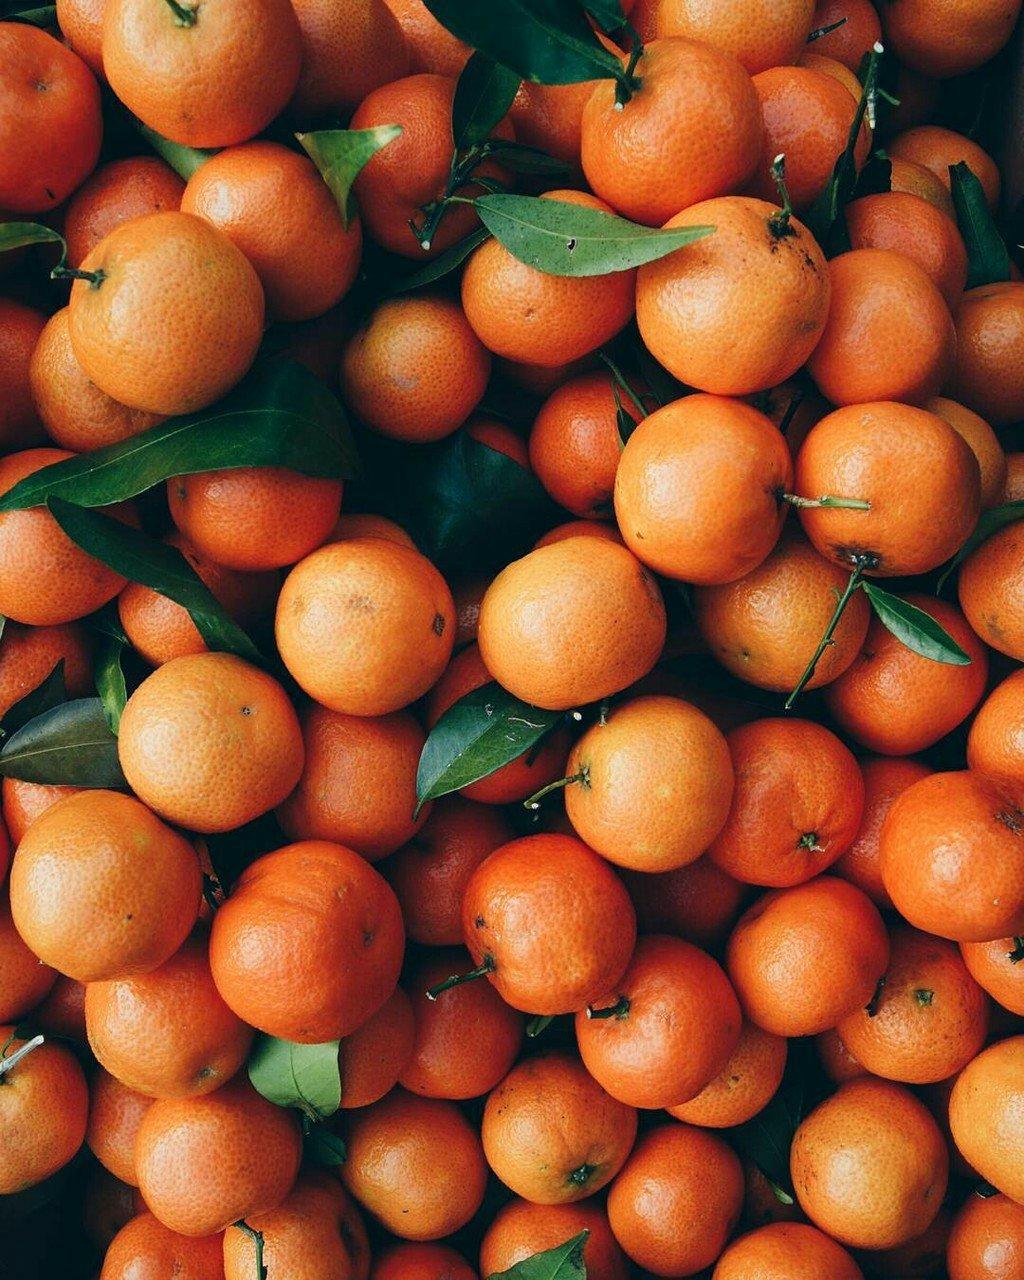 Który owoc wolisz?  #RT mandarynka #FAV borówka https://t.co/tsgO7yS4SH